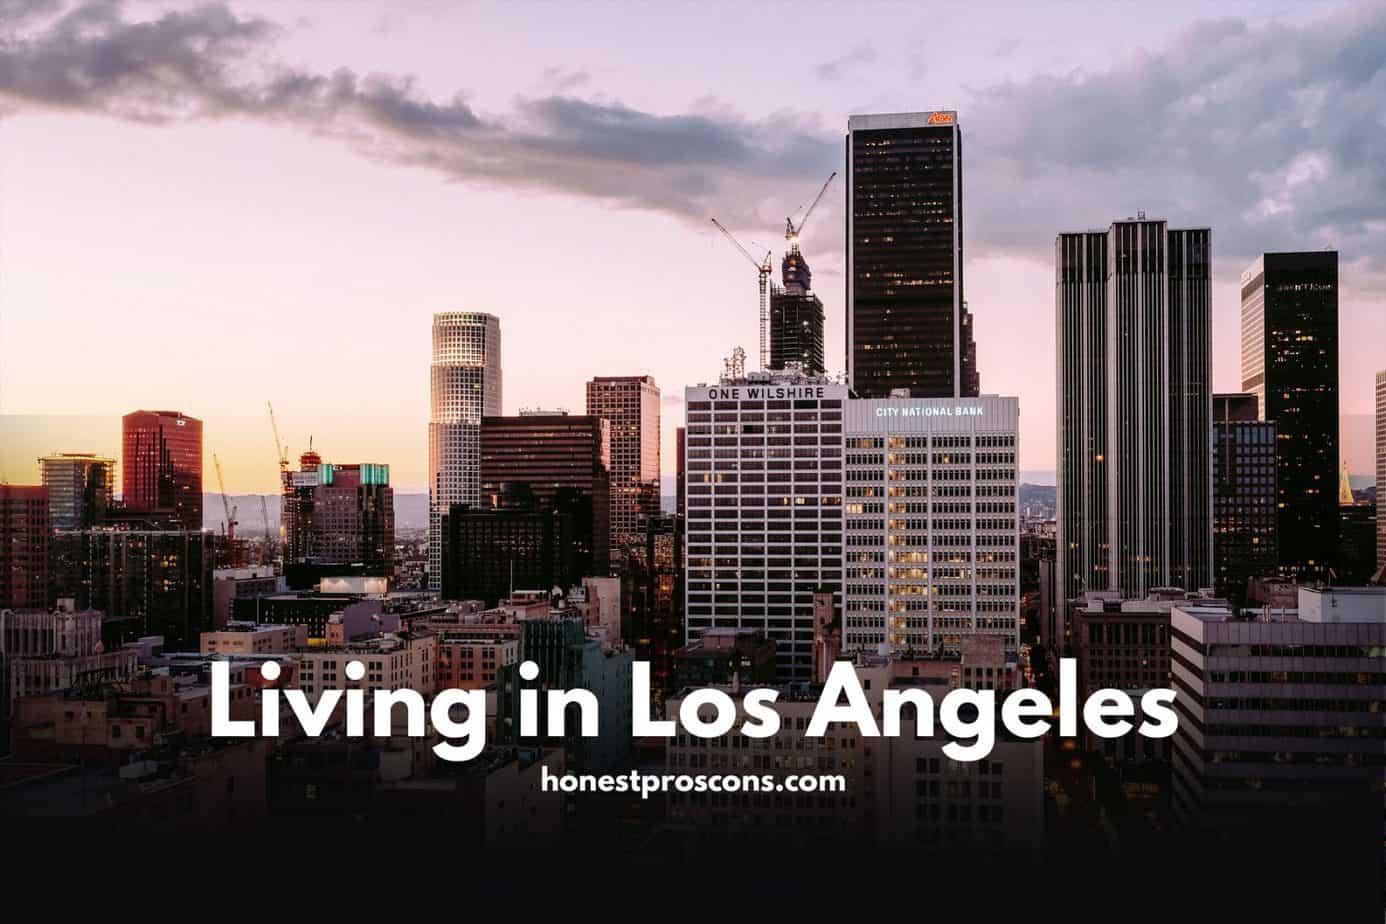 Living in Los Angeles